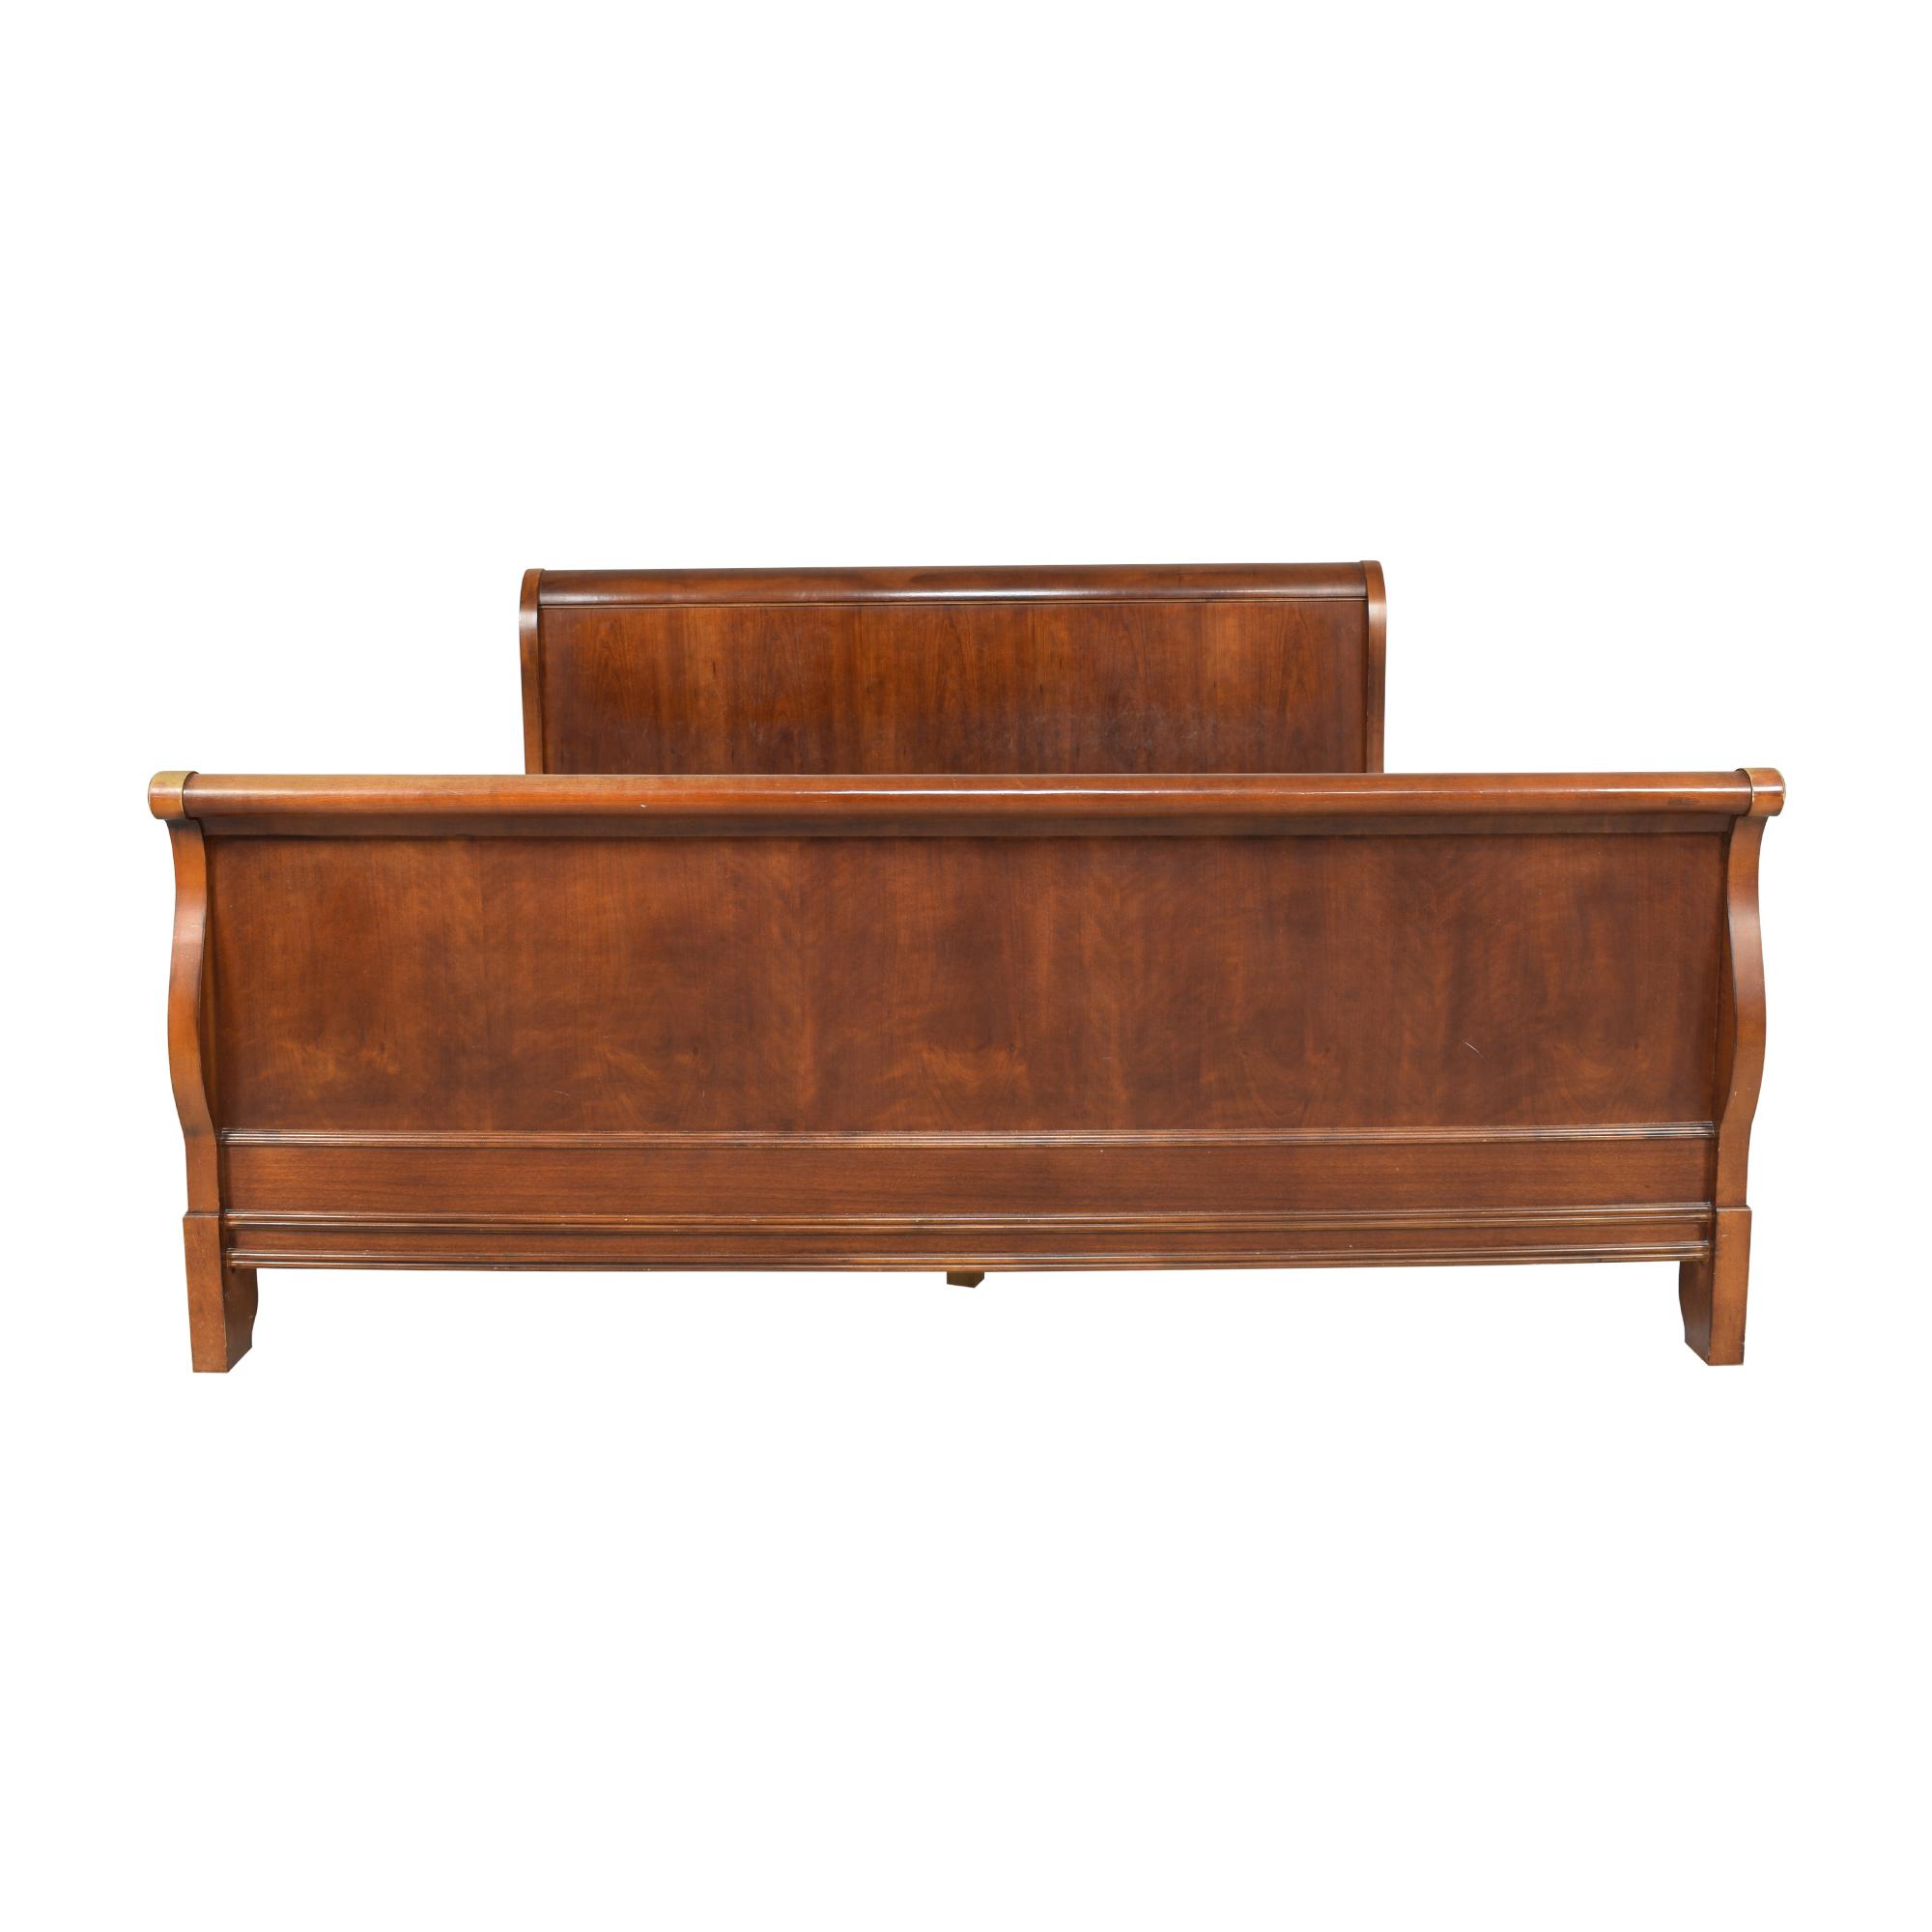 Drexel Heritage King Sleigh Bed Frame sale